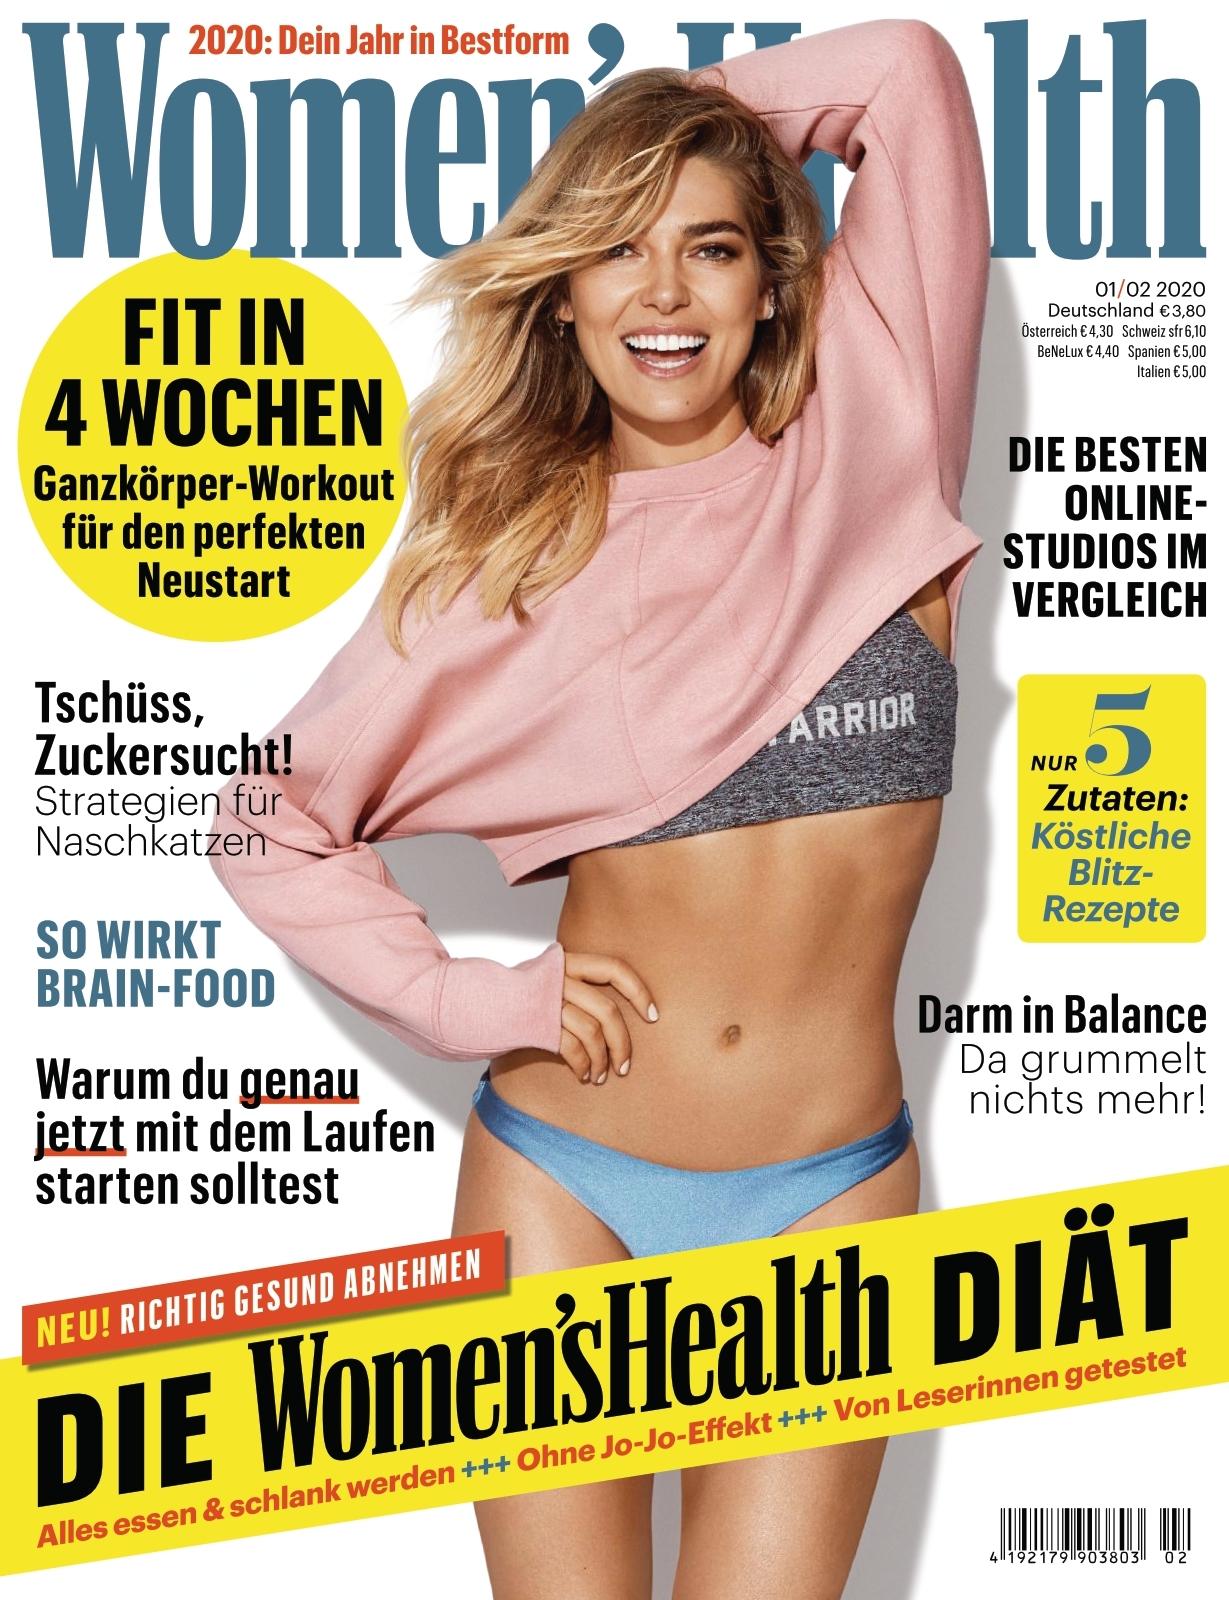 Lida rosa Gewichtsverlust Pillen